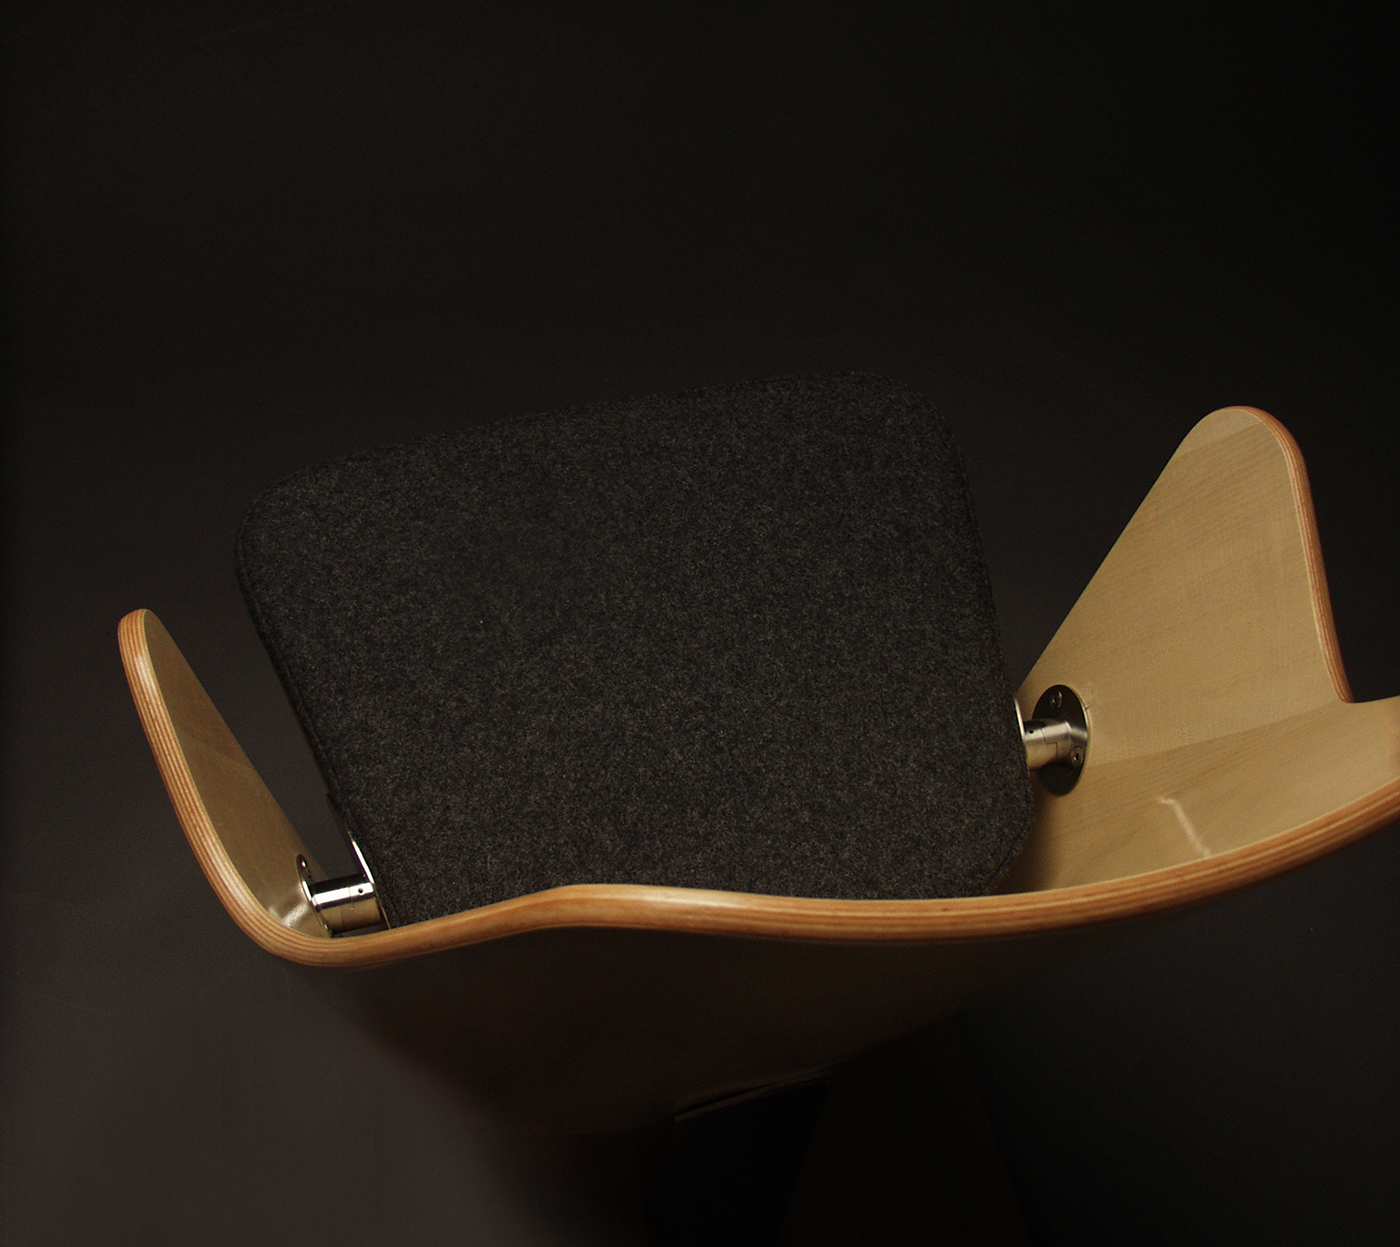 Design project - Theatre Chair